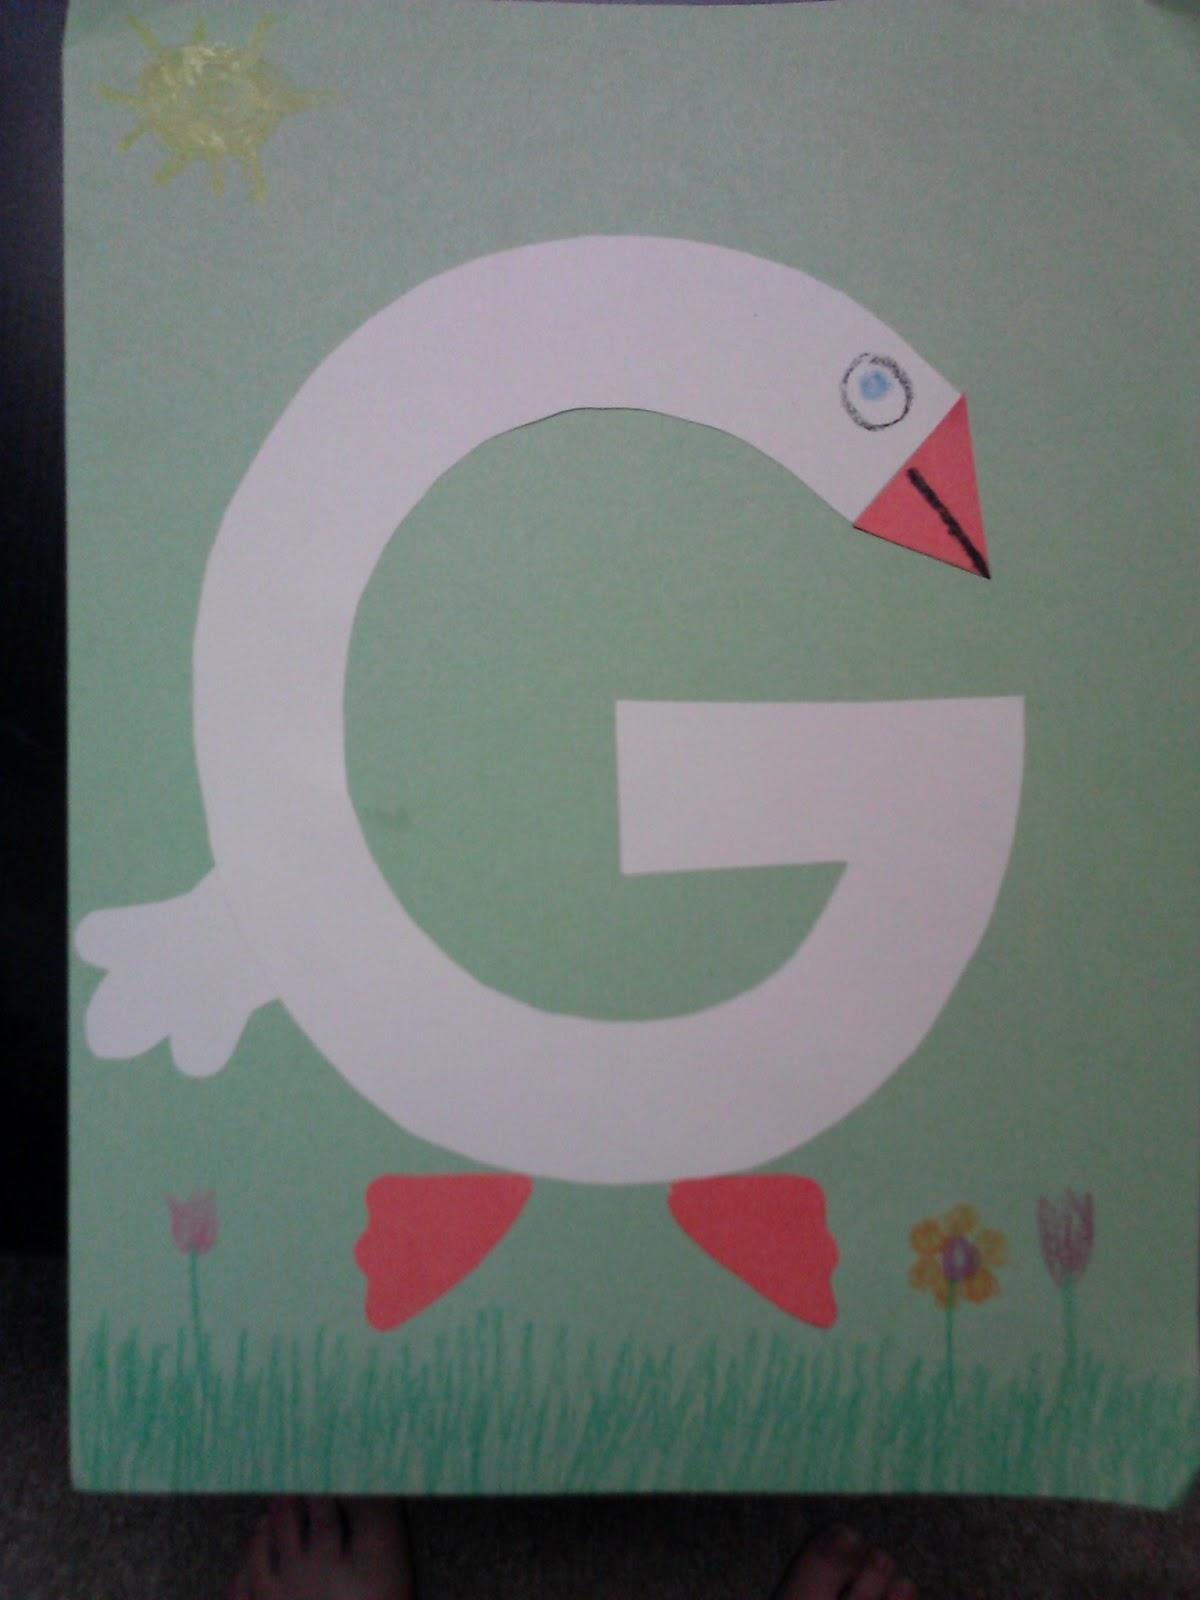 free-letter-g-crafts